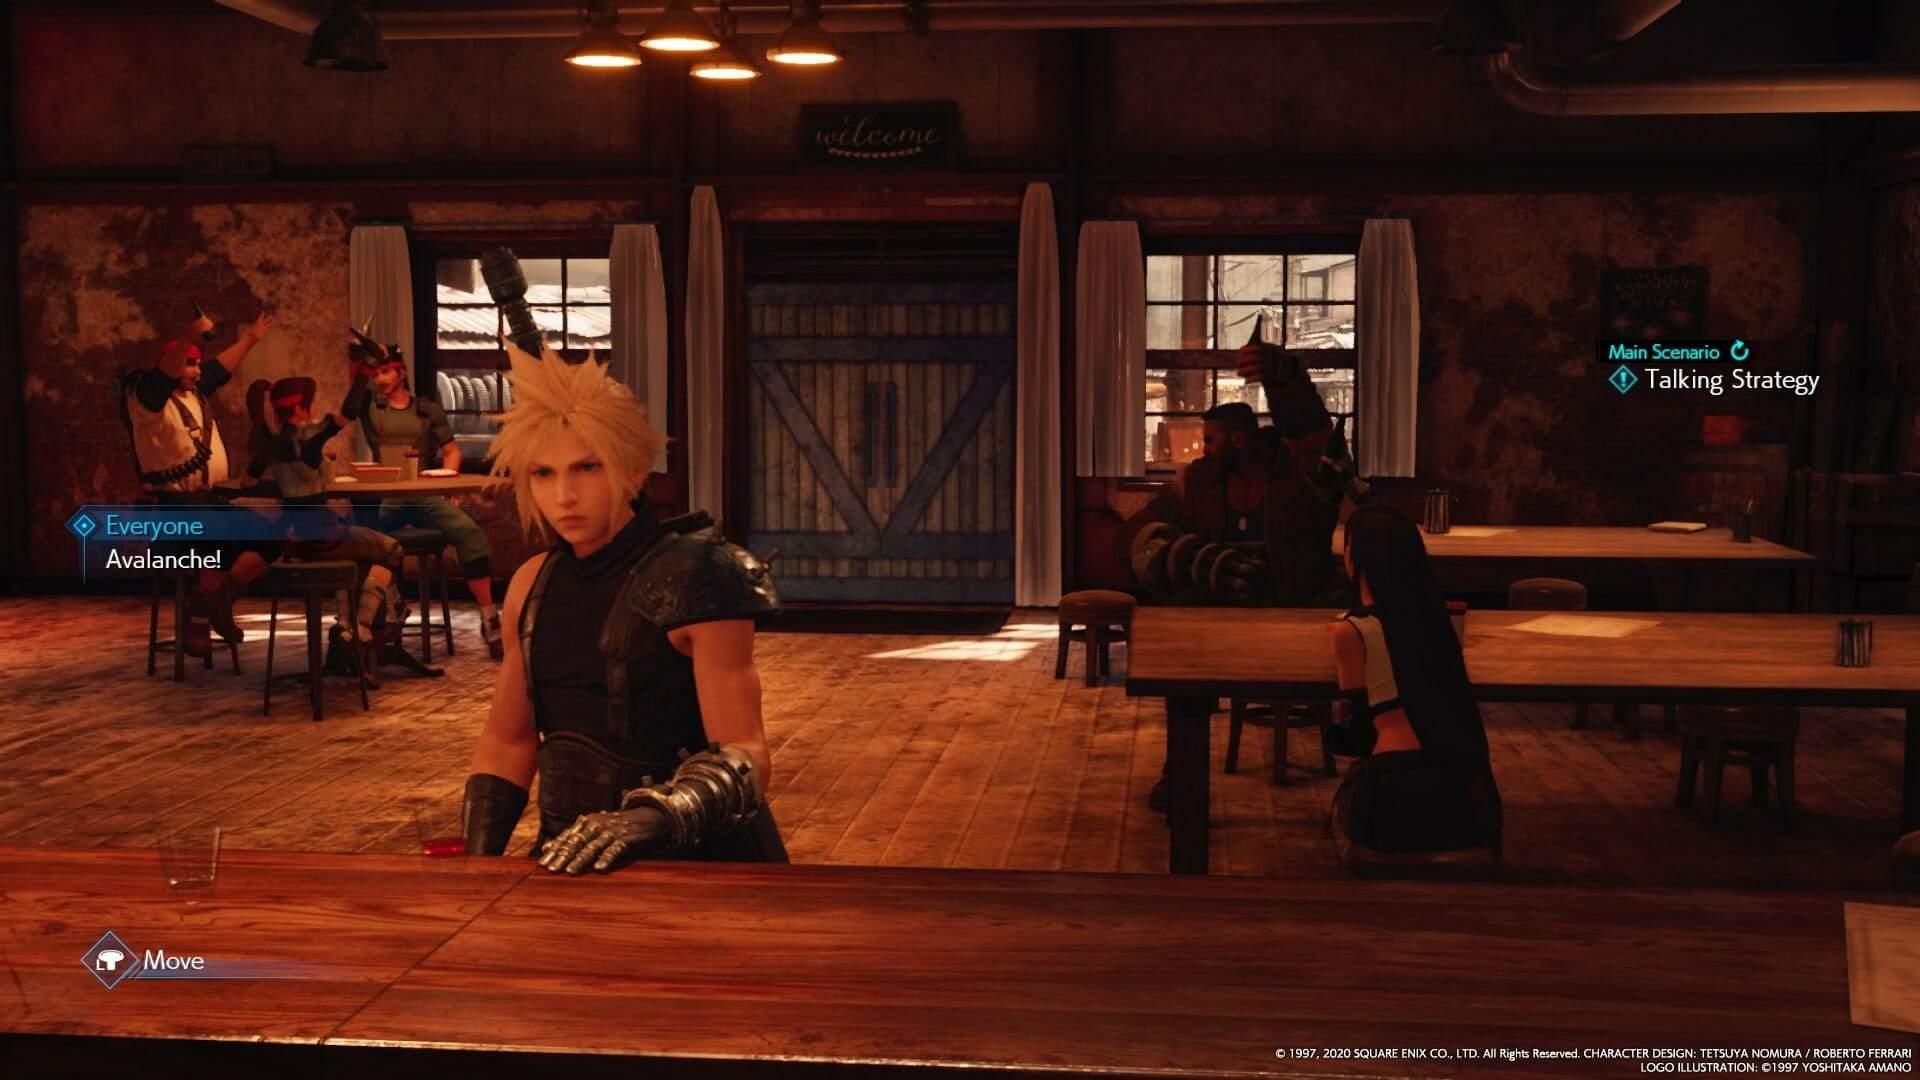 Final Fantasy VIIR